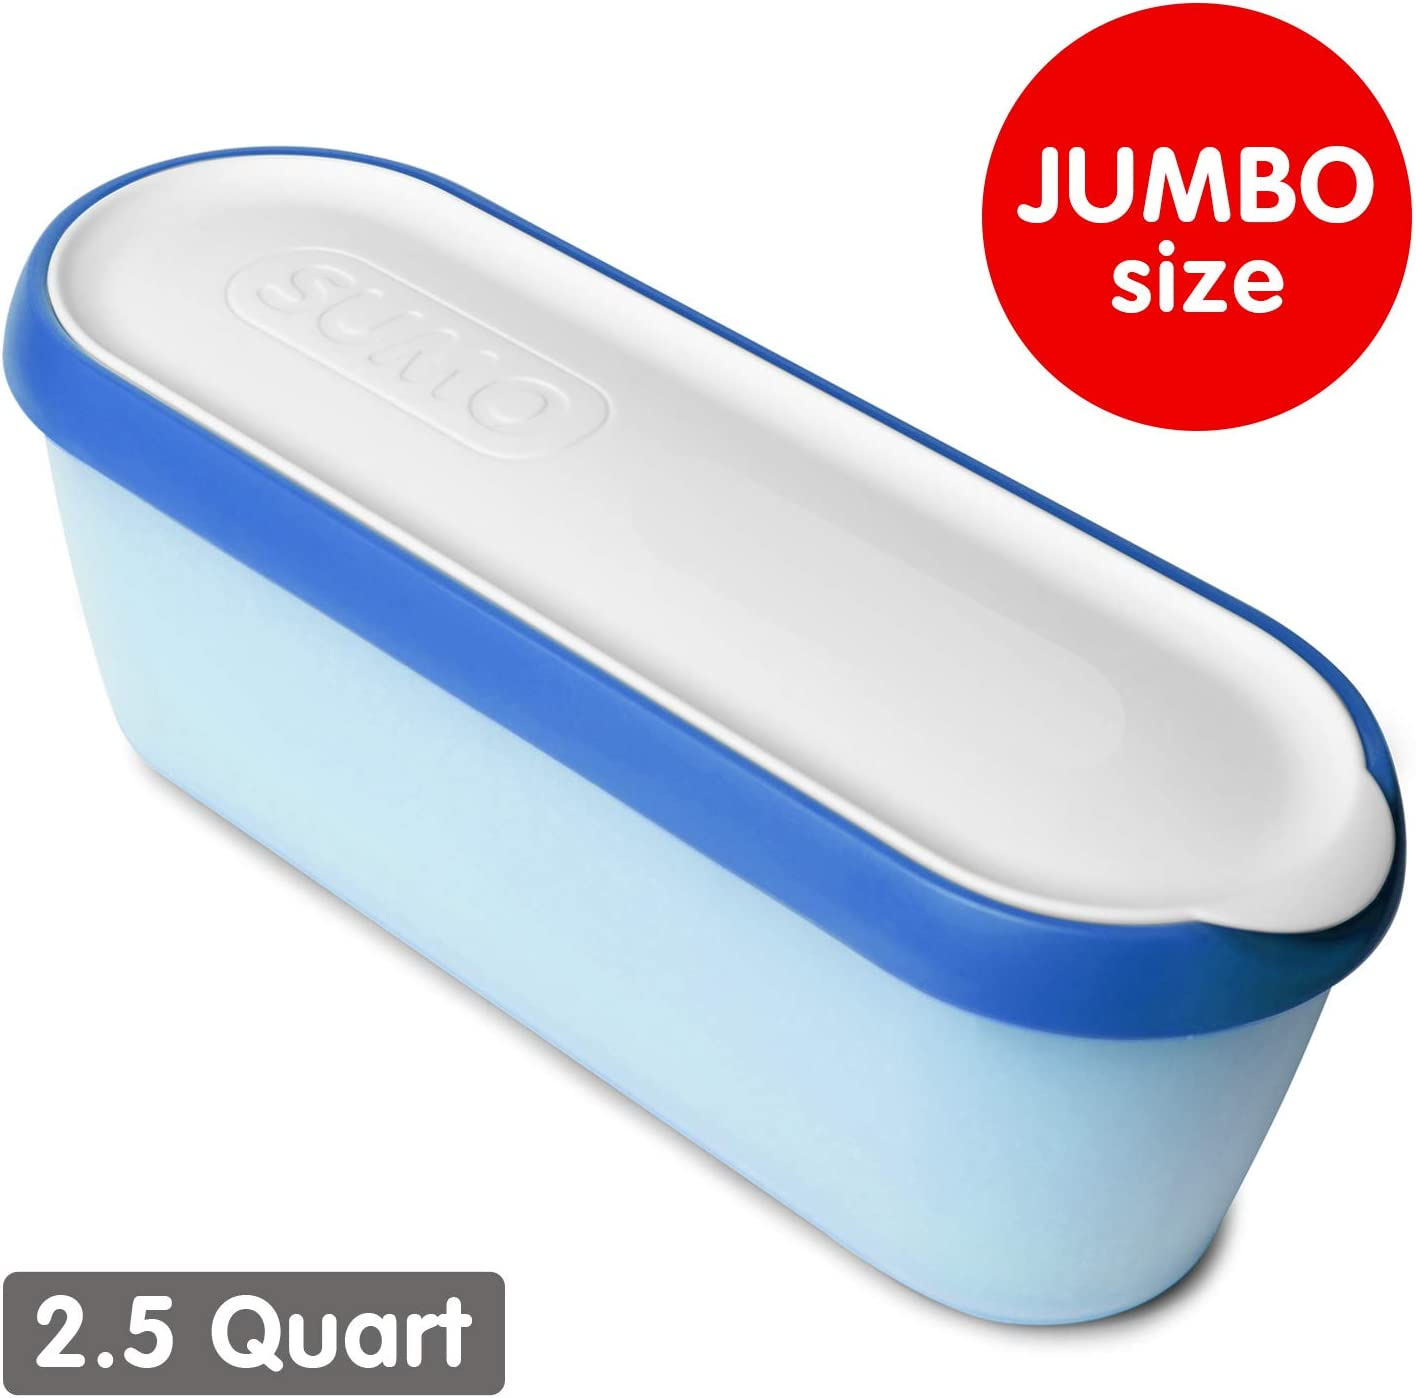 SUMO Jumbo Homemade Ice Cream Containers: Dishwasher Safe Tub. 2.5 Quart (Blue)